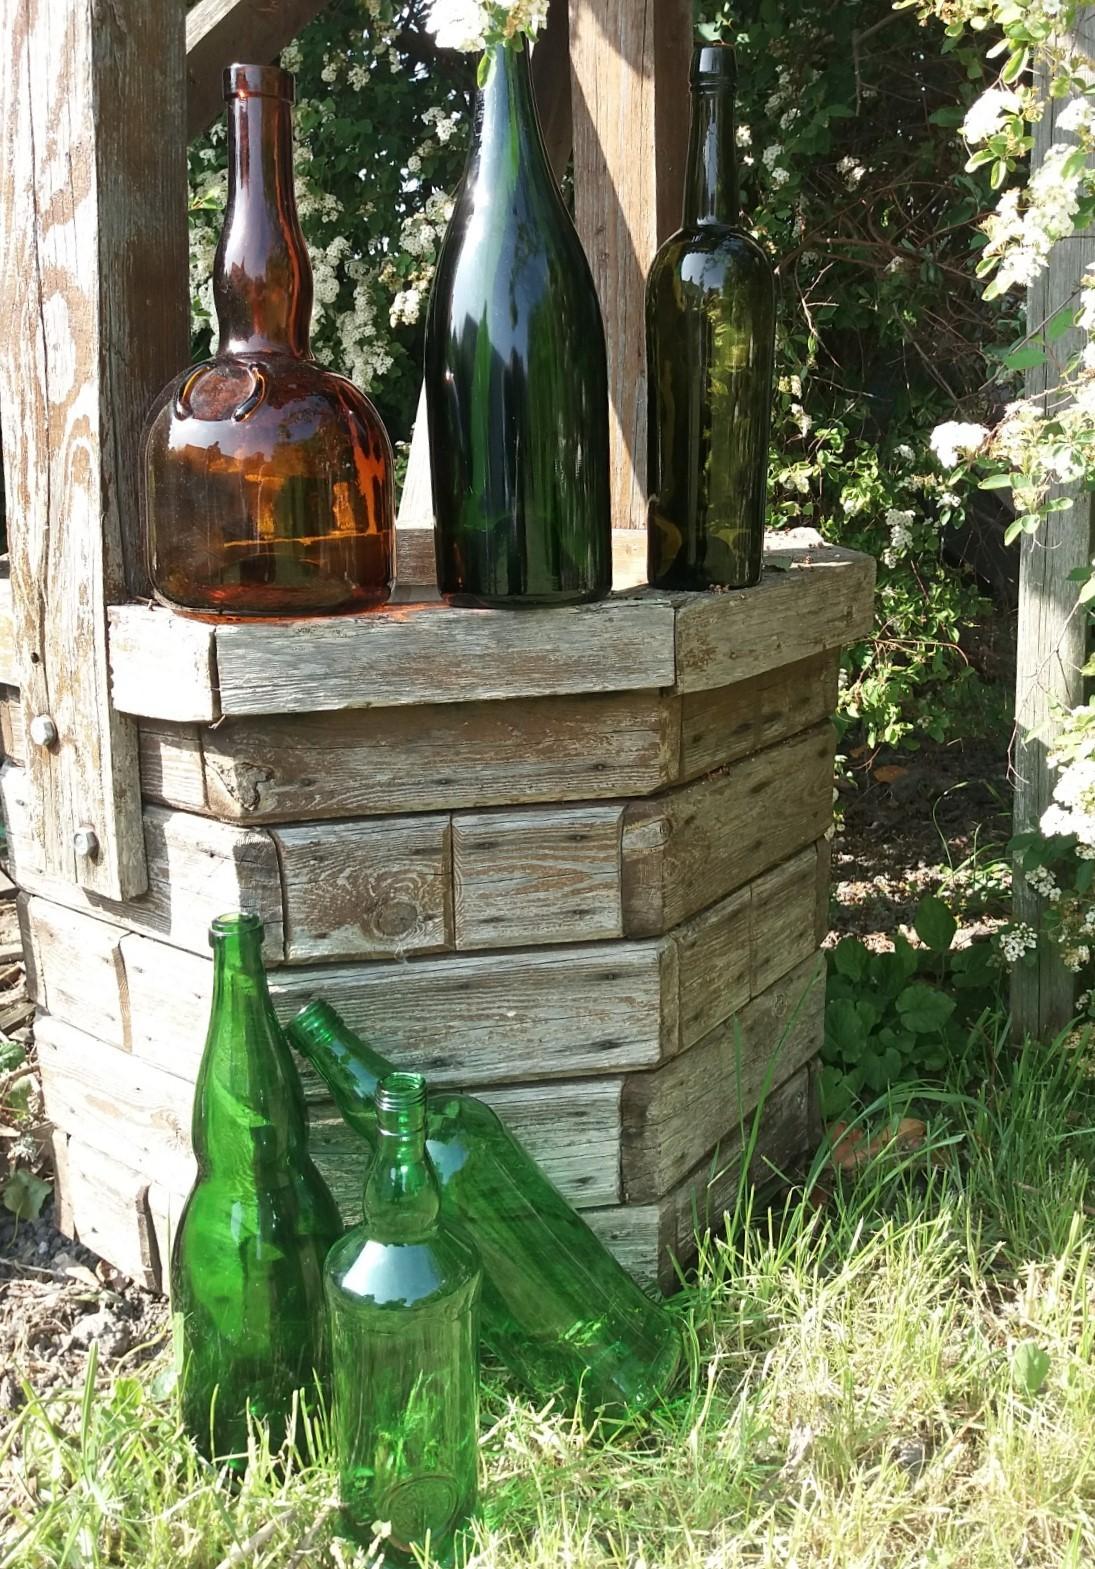 Location bouteille ancienne - 1.00€ piéce